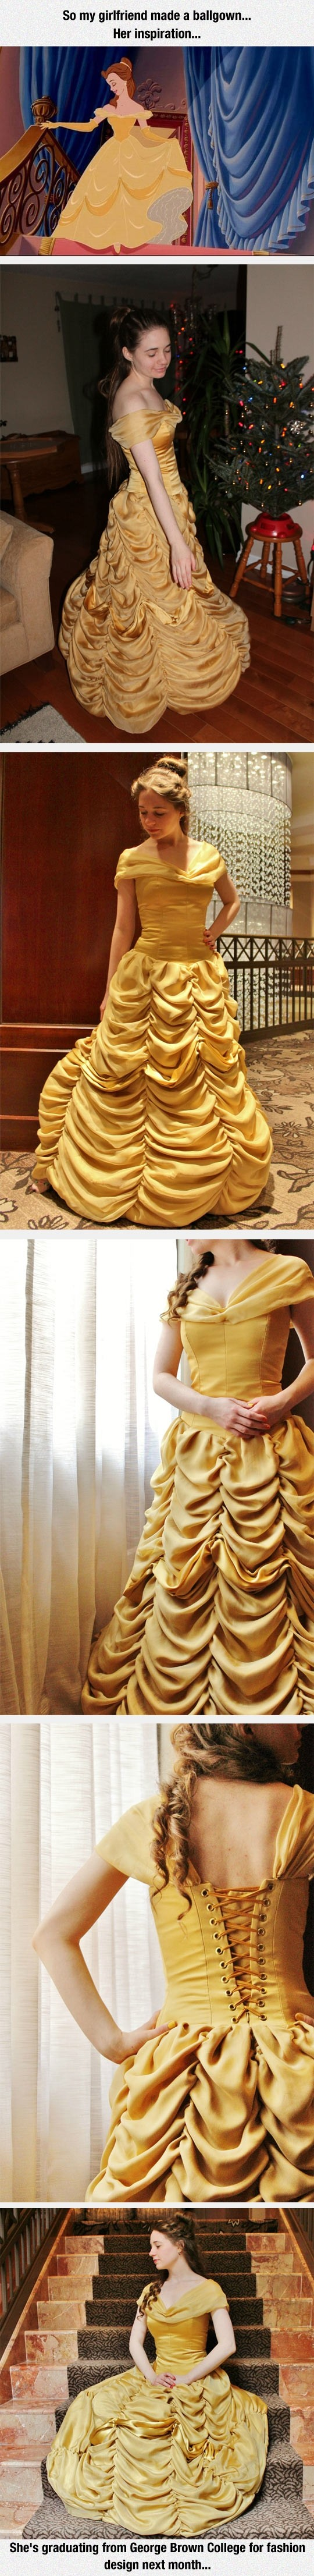 Amazing Dress Inspired By A Disney Princess http://ibeebz.com